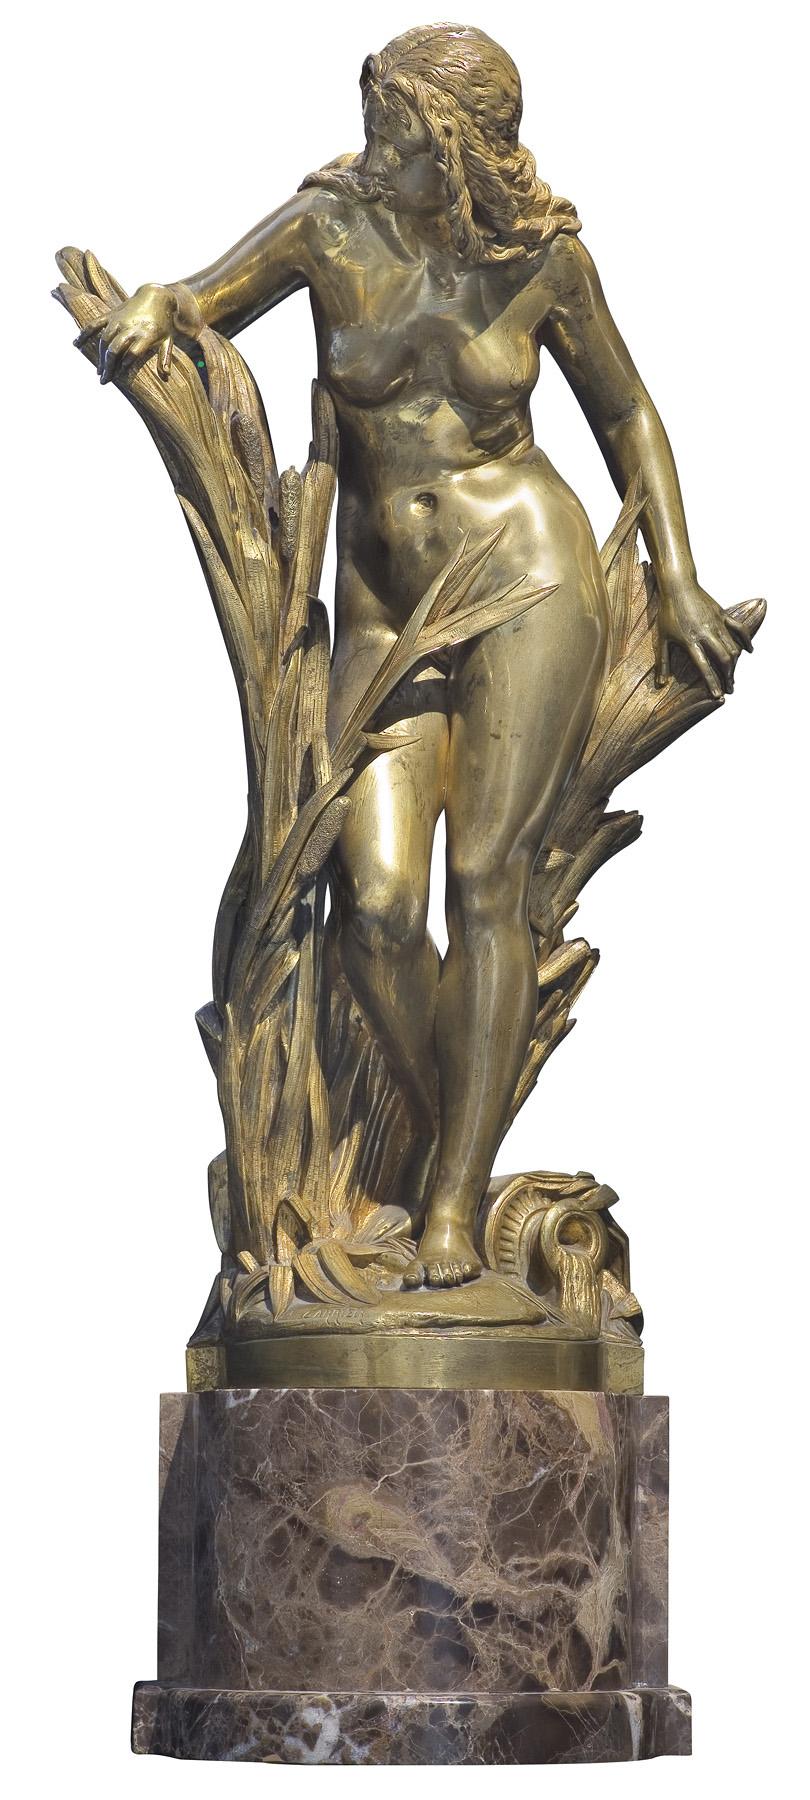 ALBERT ERNEST CARRIER-BELLEUSE (Anizy-le-Château, Aisne 1824 – Sévres 1887), wg.